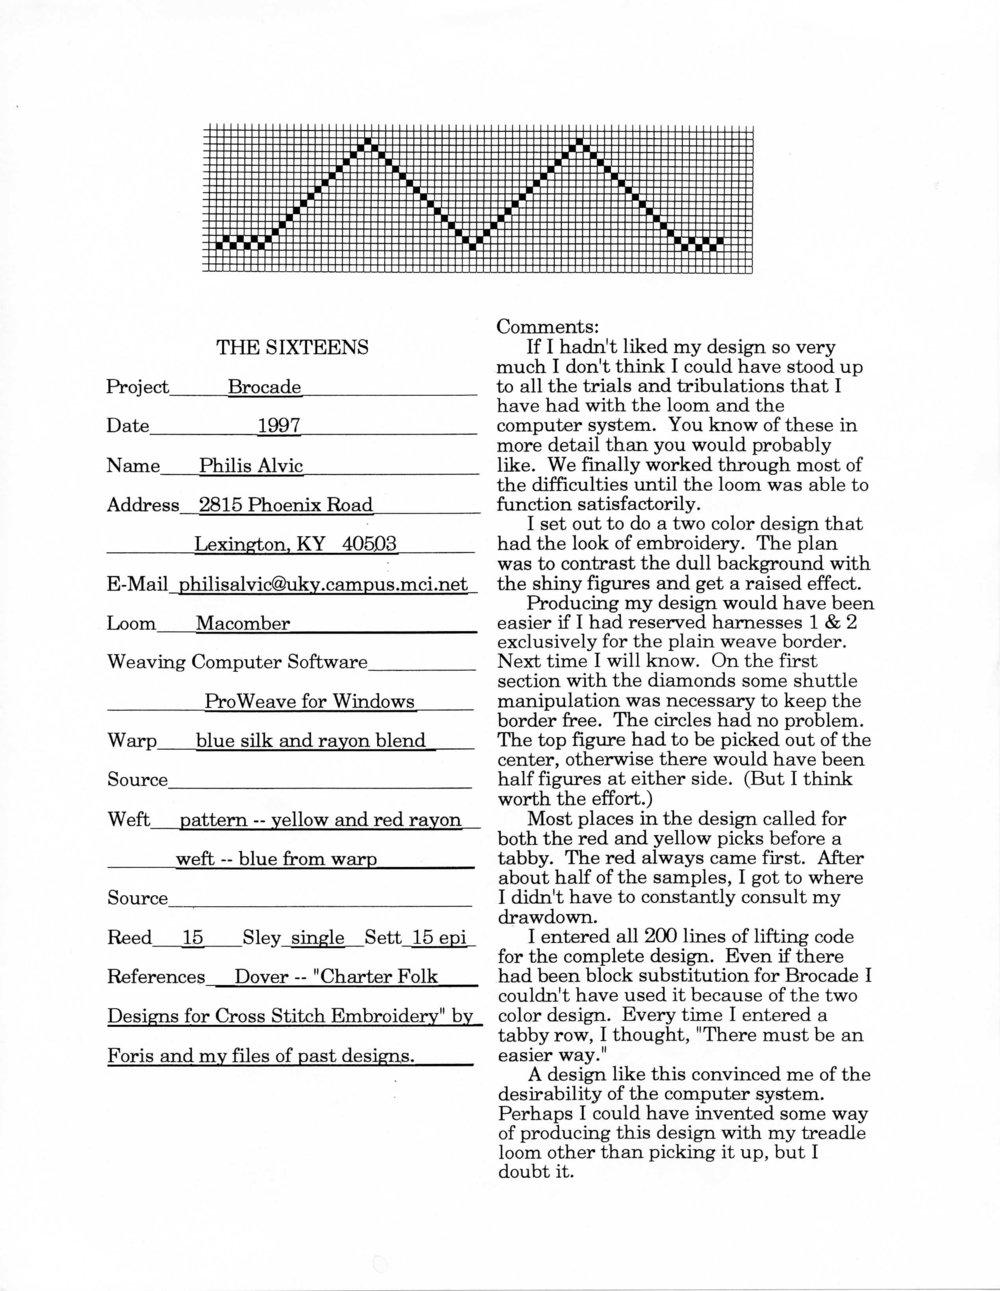 1997_Page_1_Image_0001.jpg